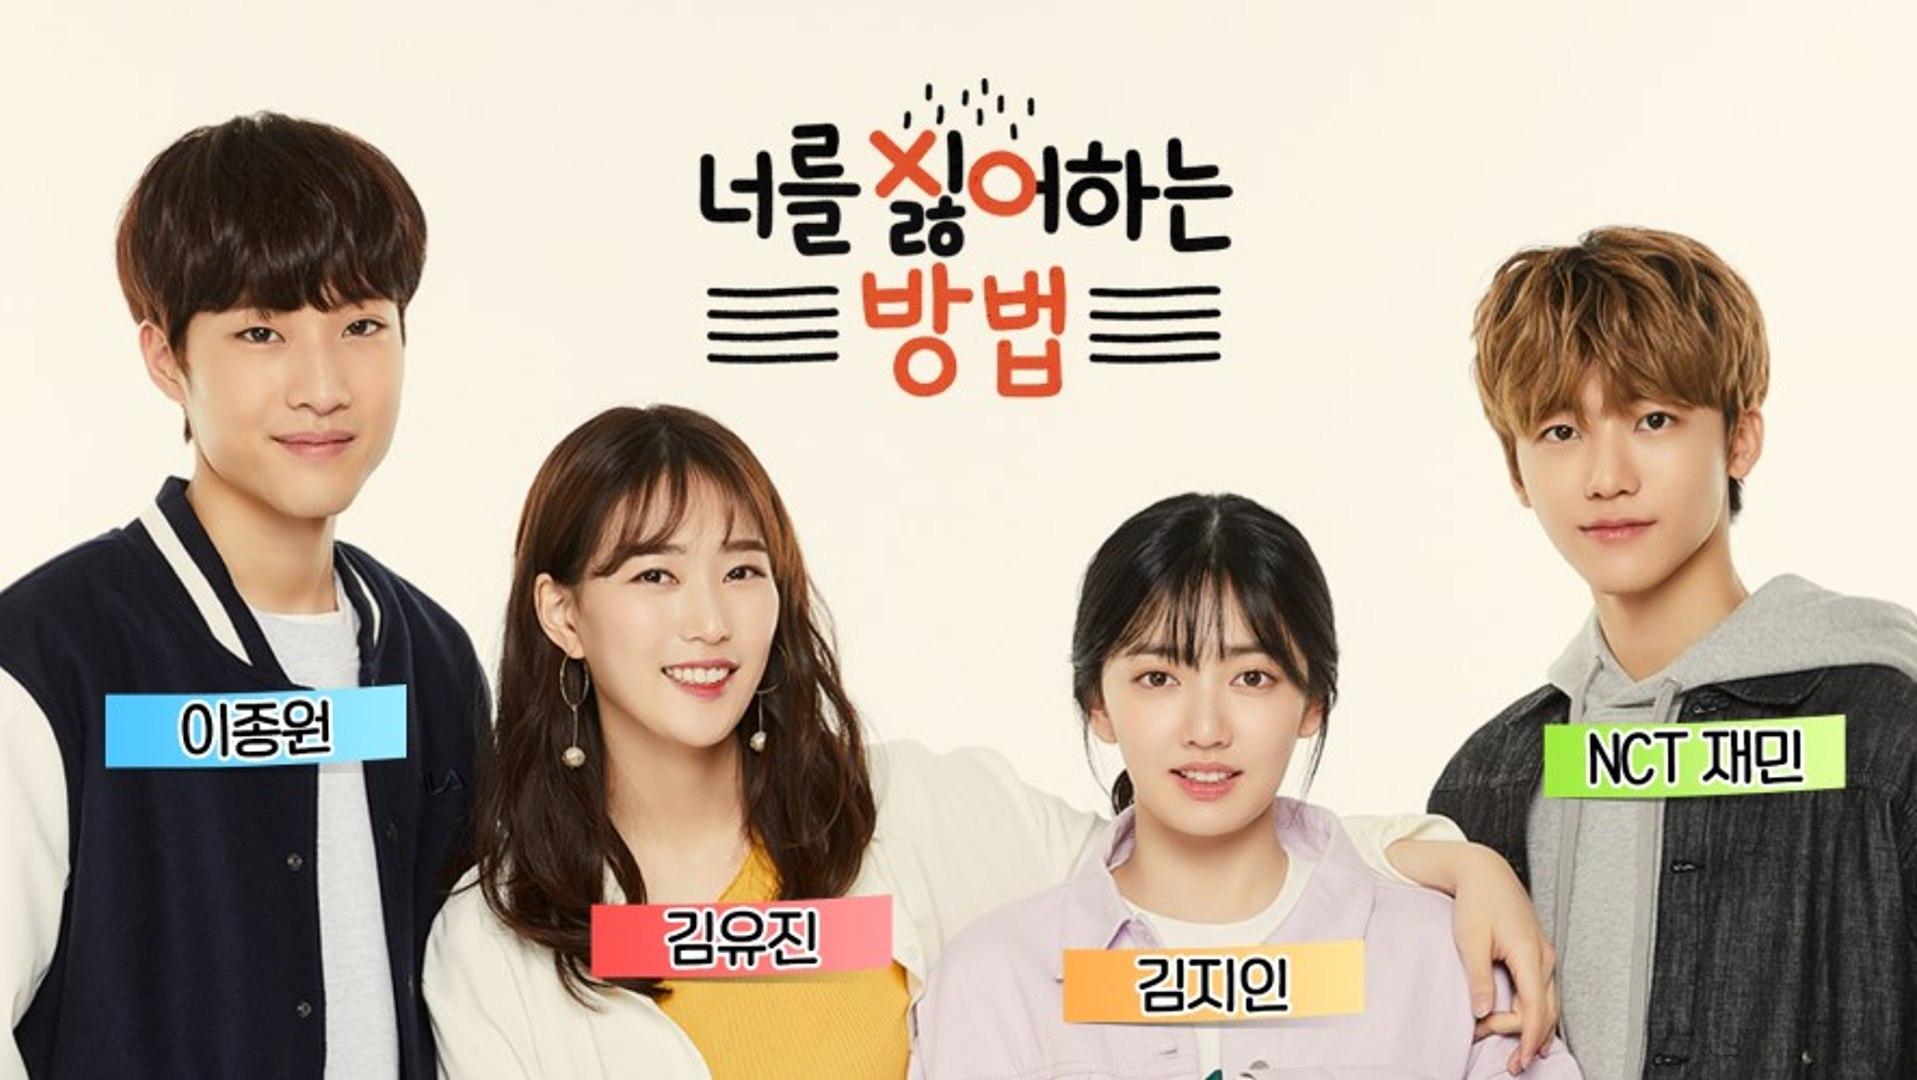 Rekomendasi Drama Korea Romantis Adaptasi dari Webtoon 8